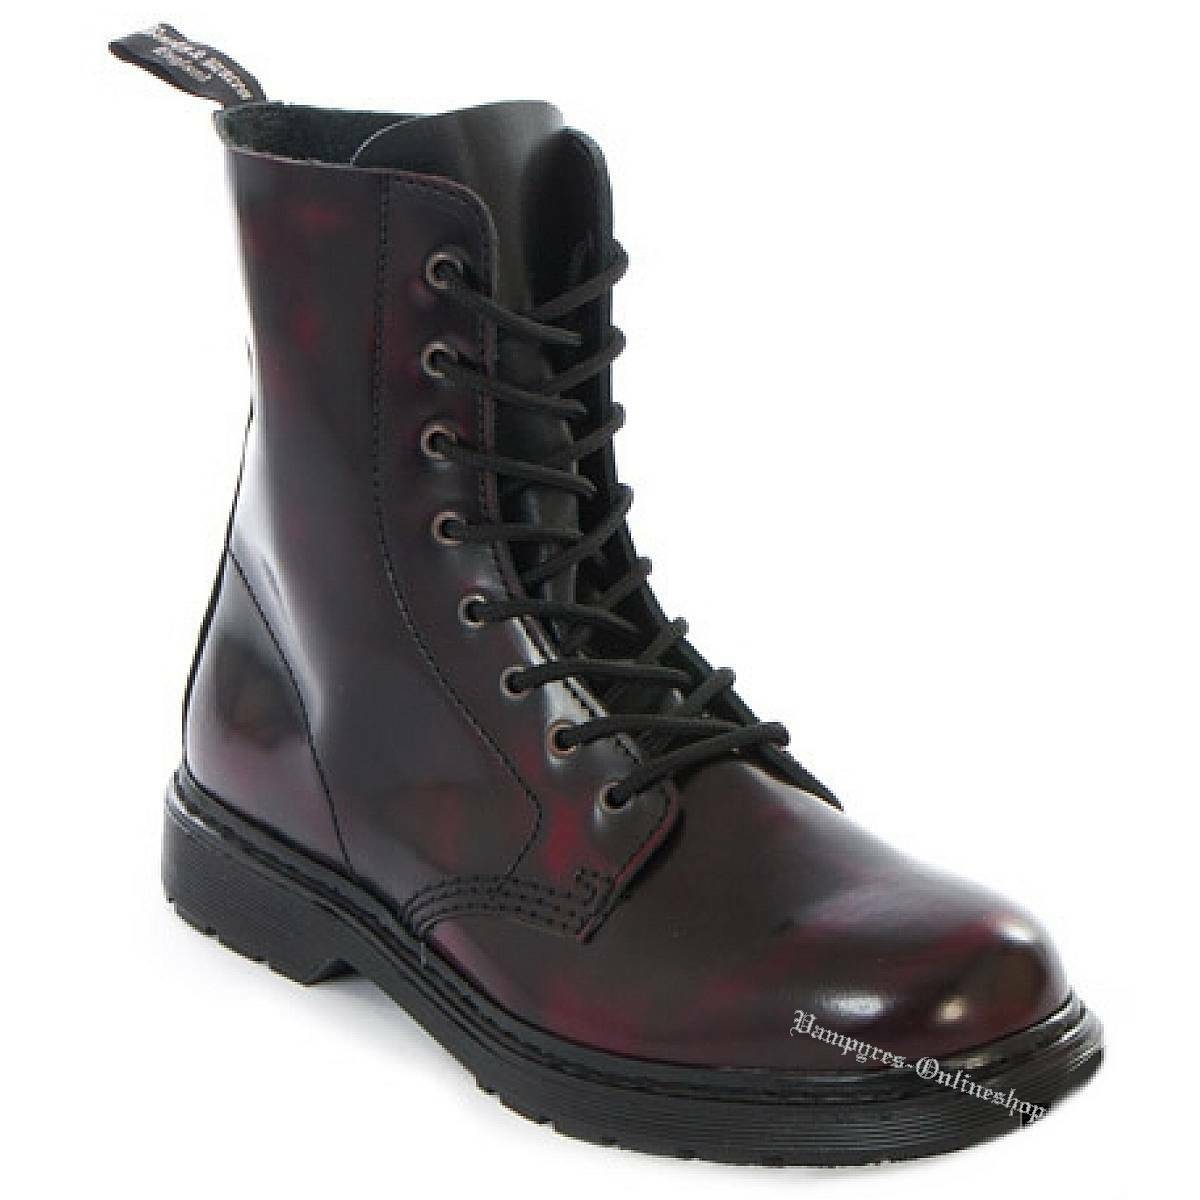 Boots and braces Easy 8 agujeros Burgundy Rub-off cuero negro rojo botas zapatos